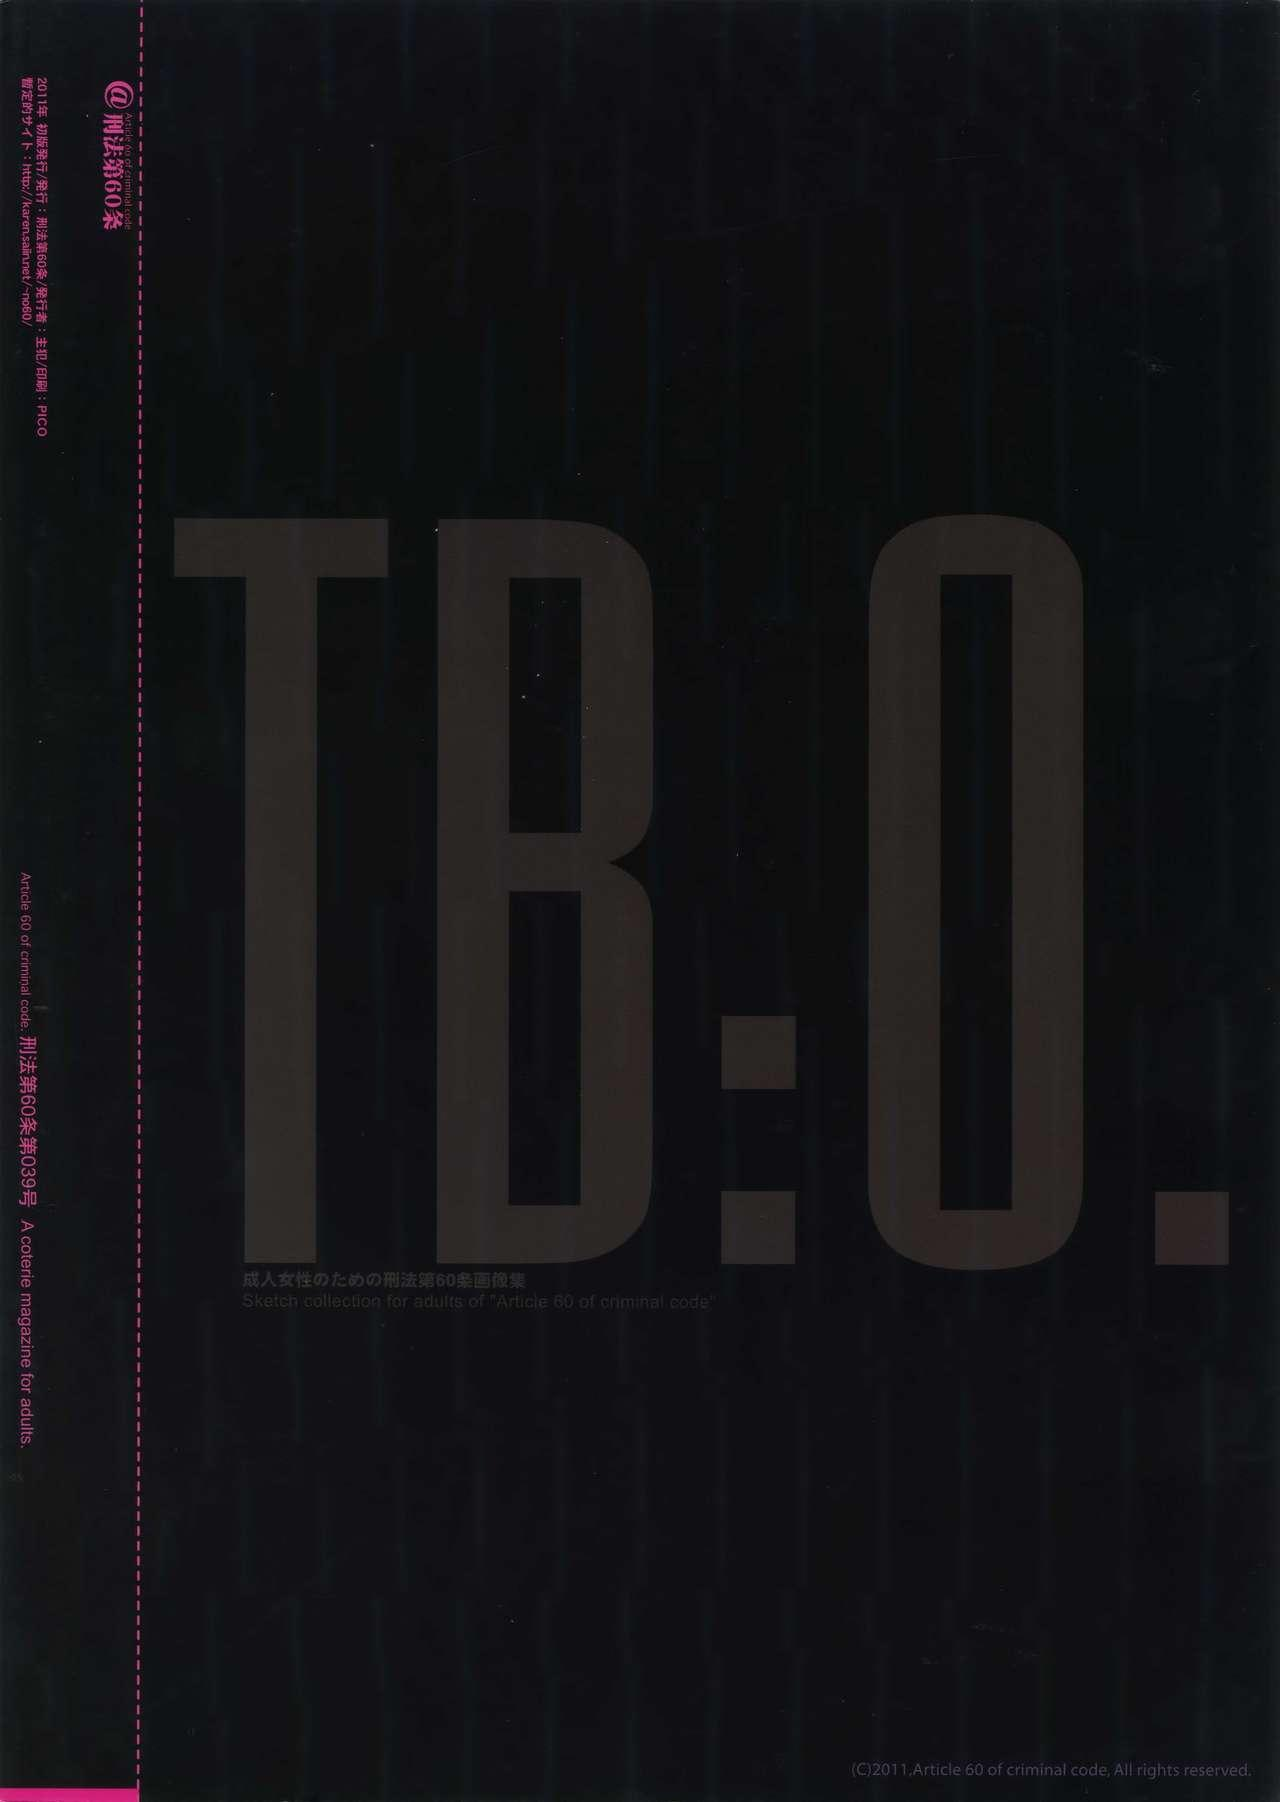 TB:0 23